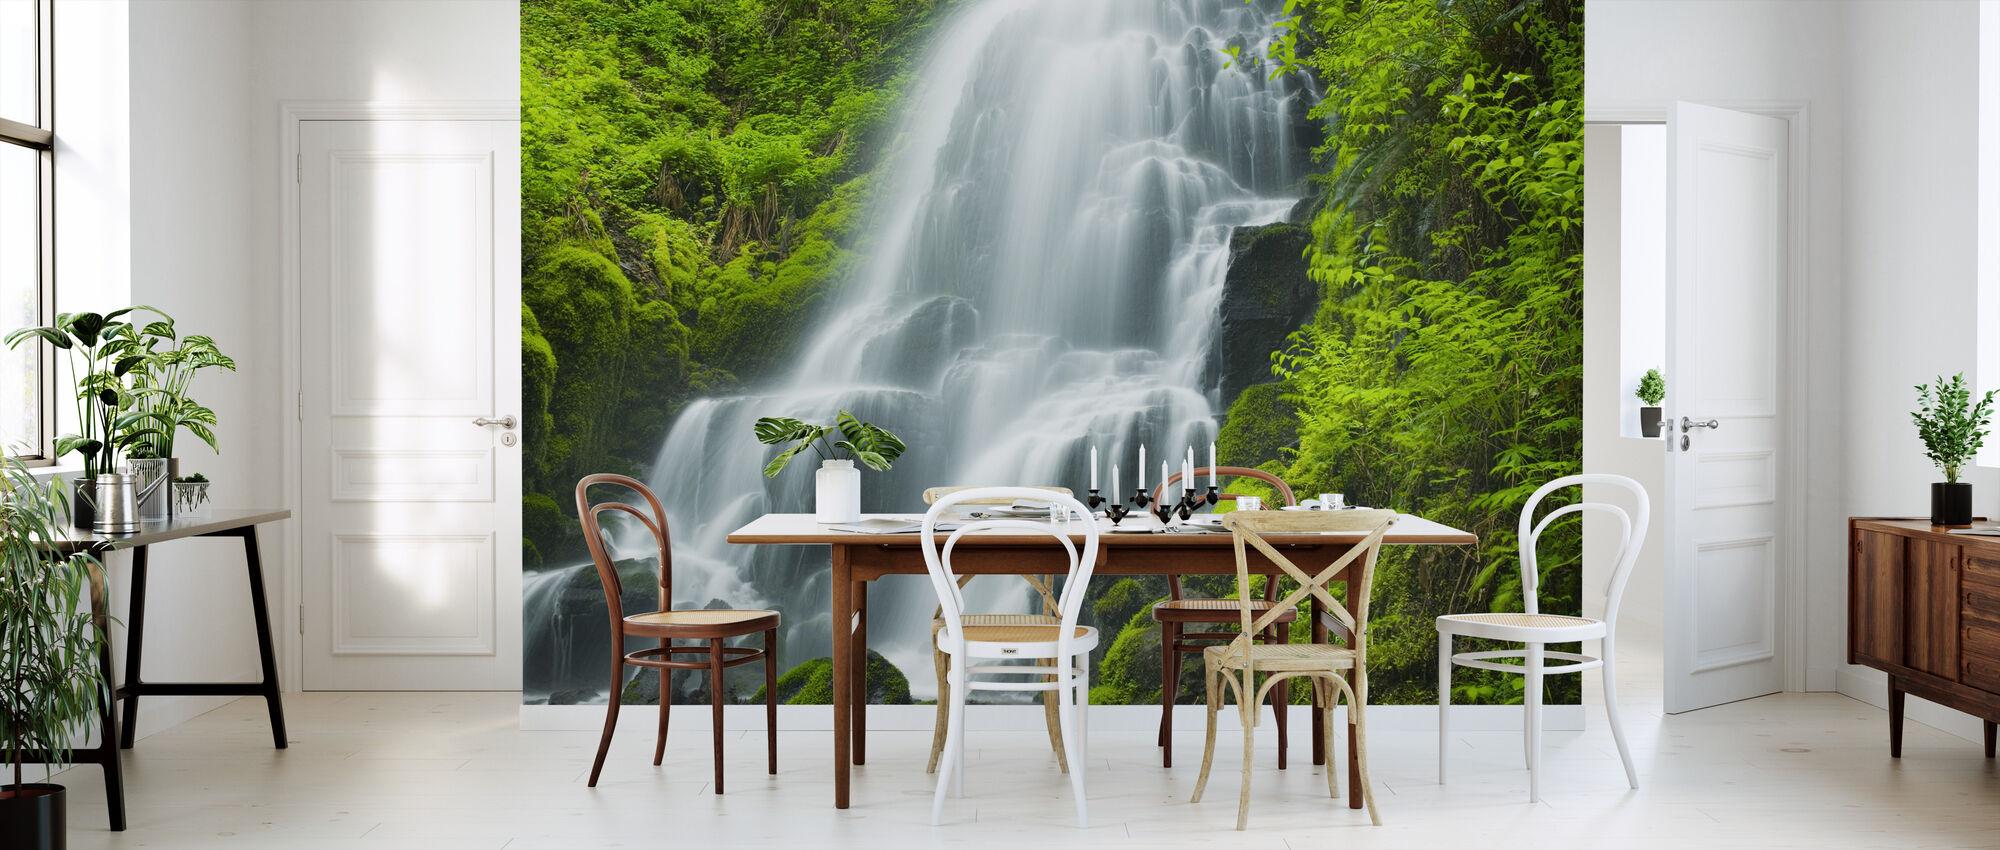 fairy falls fototapete nach ma photowall. Black Bedroom Furniture Sets. Home Design Ideas